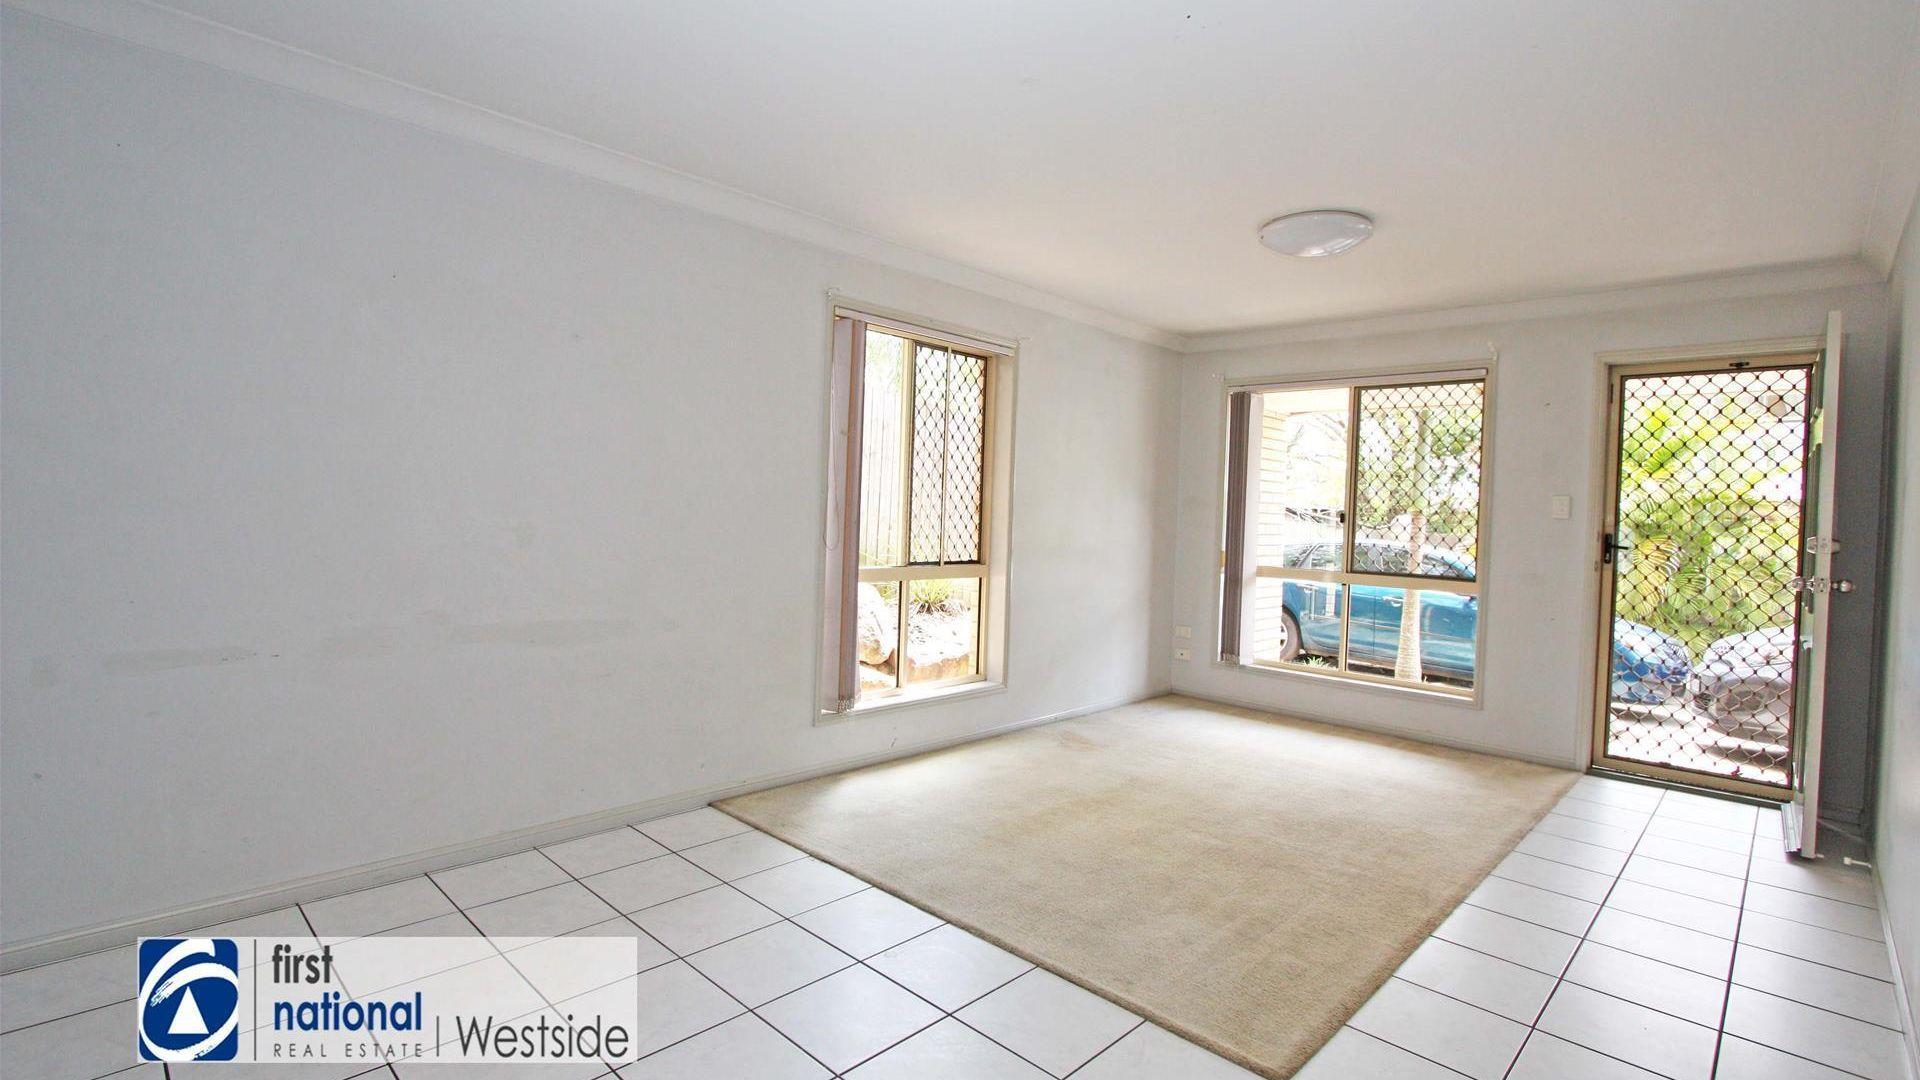 5/7 Ipswich Street, Riverview QLD 4303, Image 2